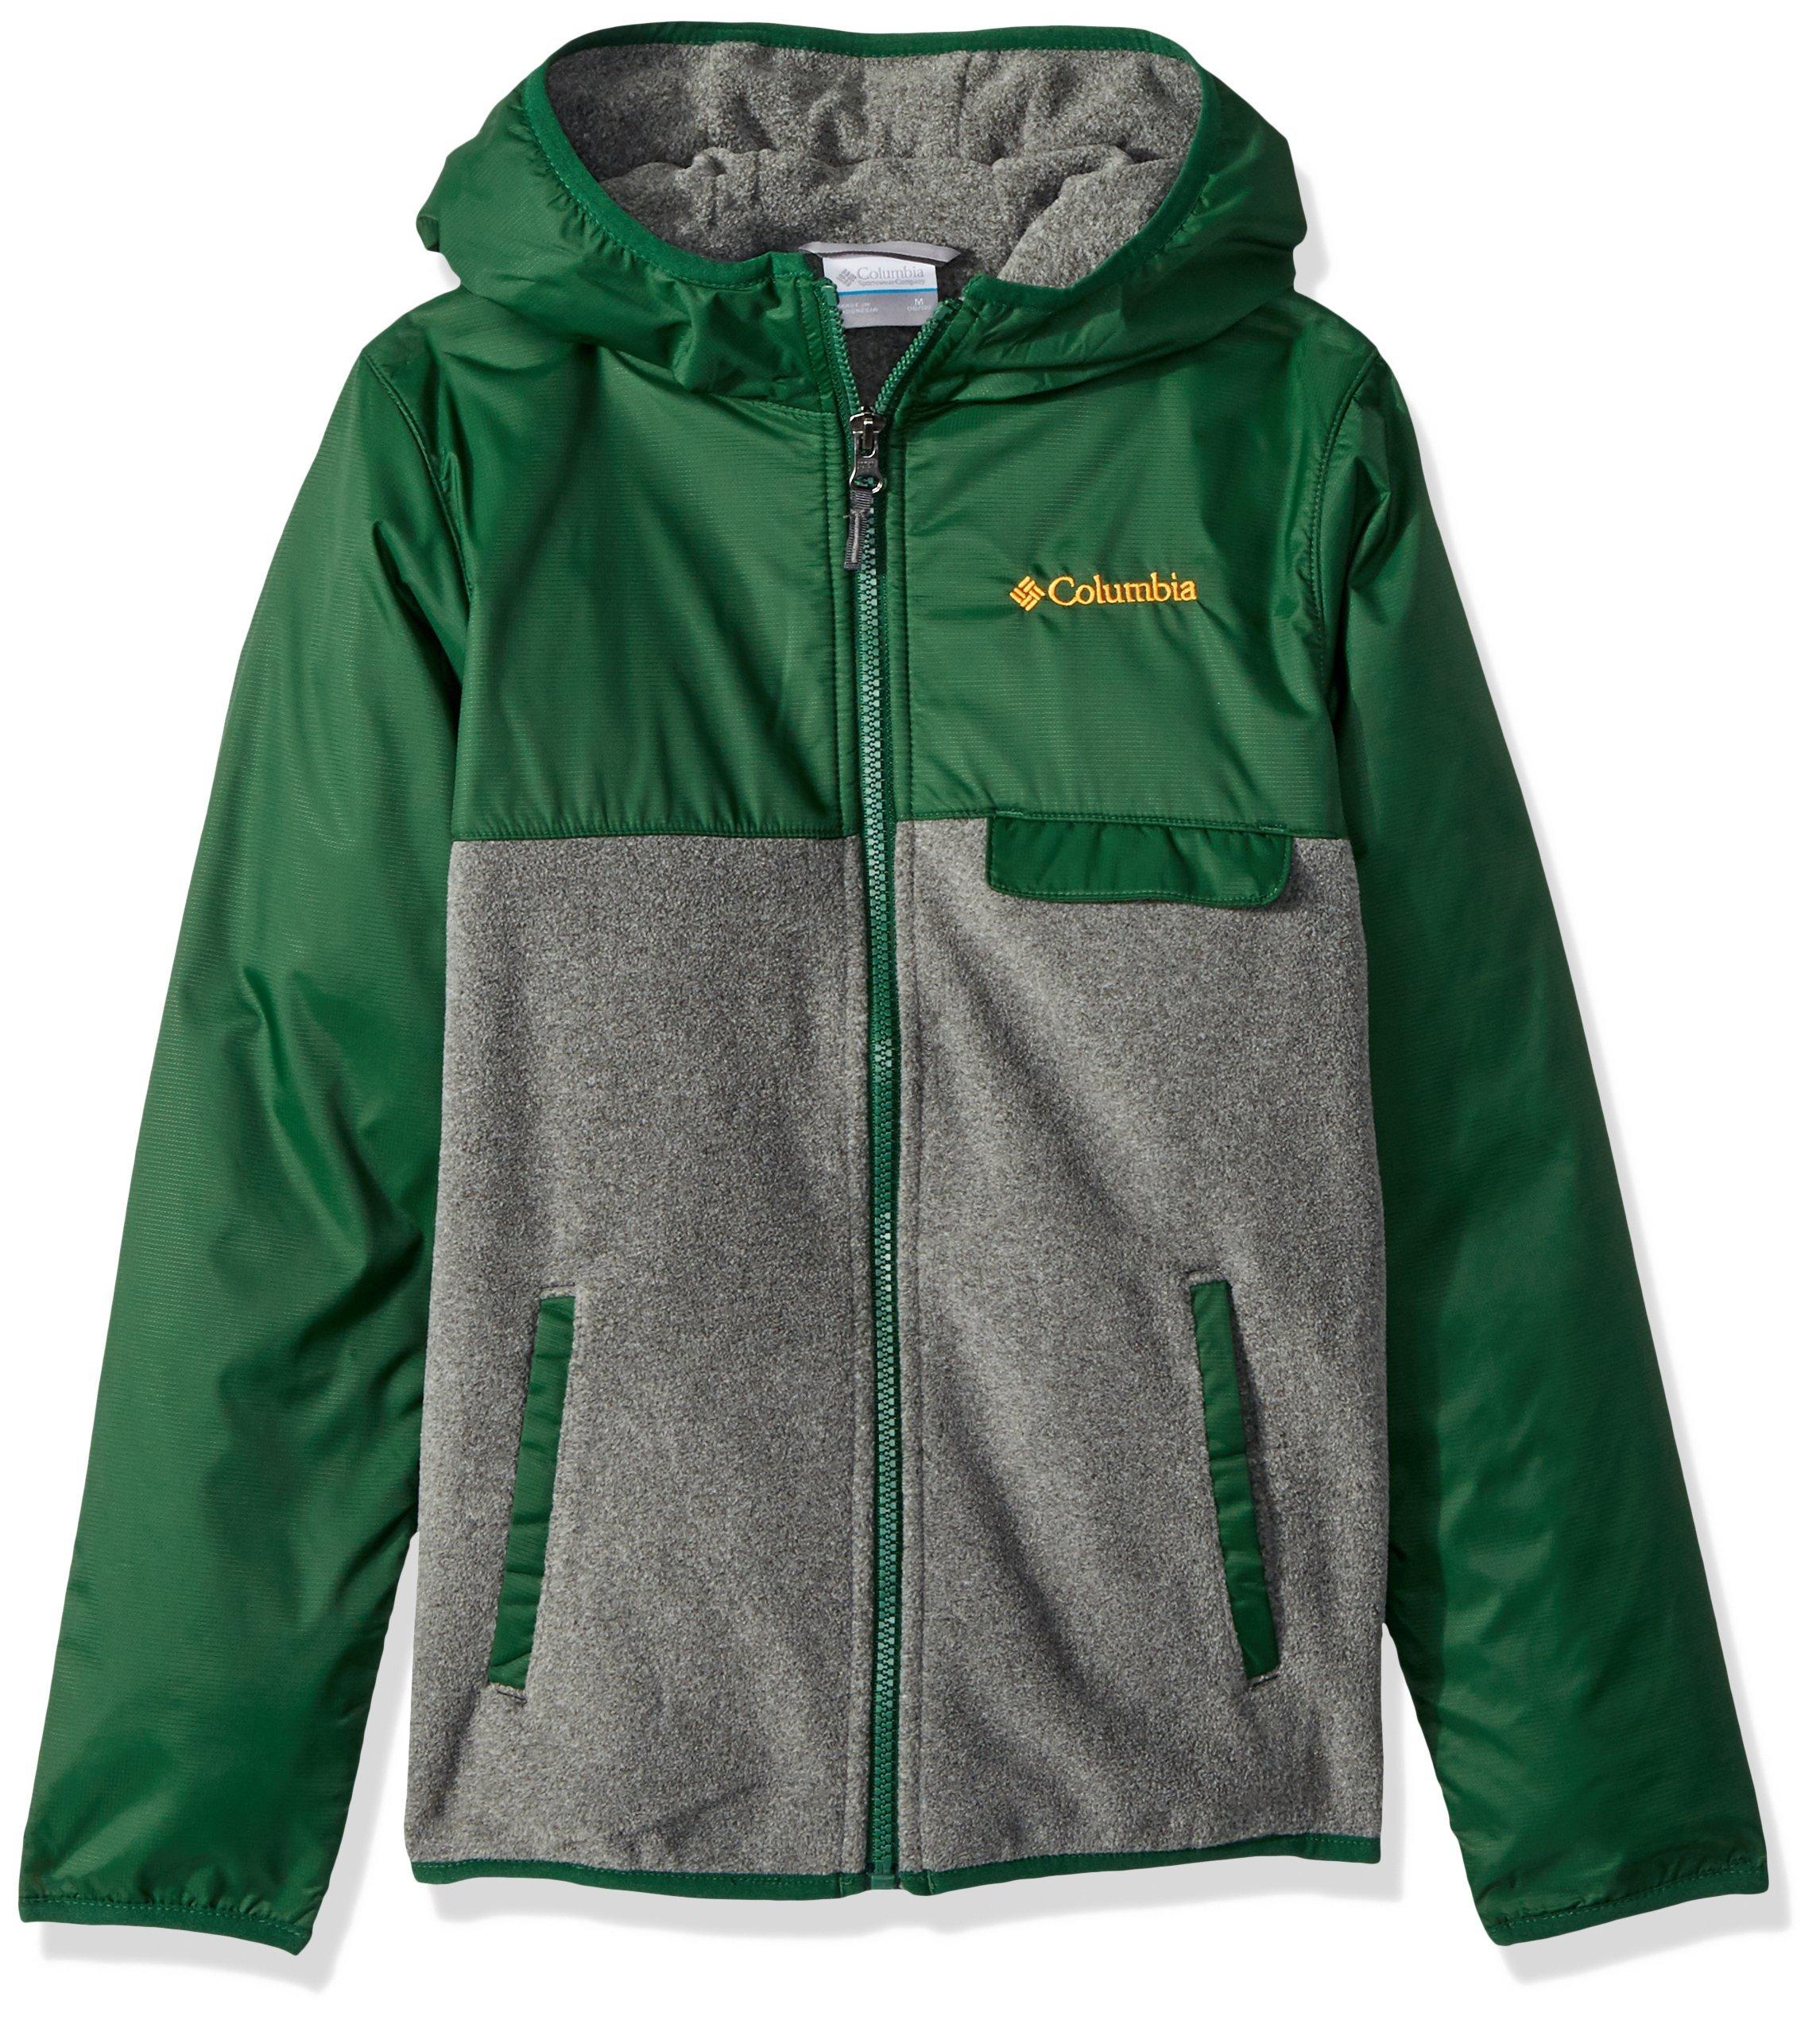 Columbia Little Boys' Mountain SideOverlay Full Zip Fleece, Forest/Grill Heather, X-Small